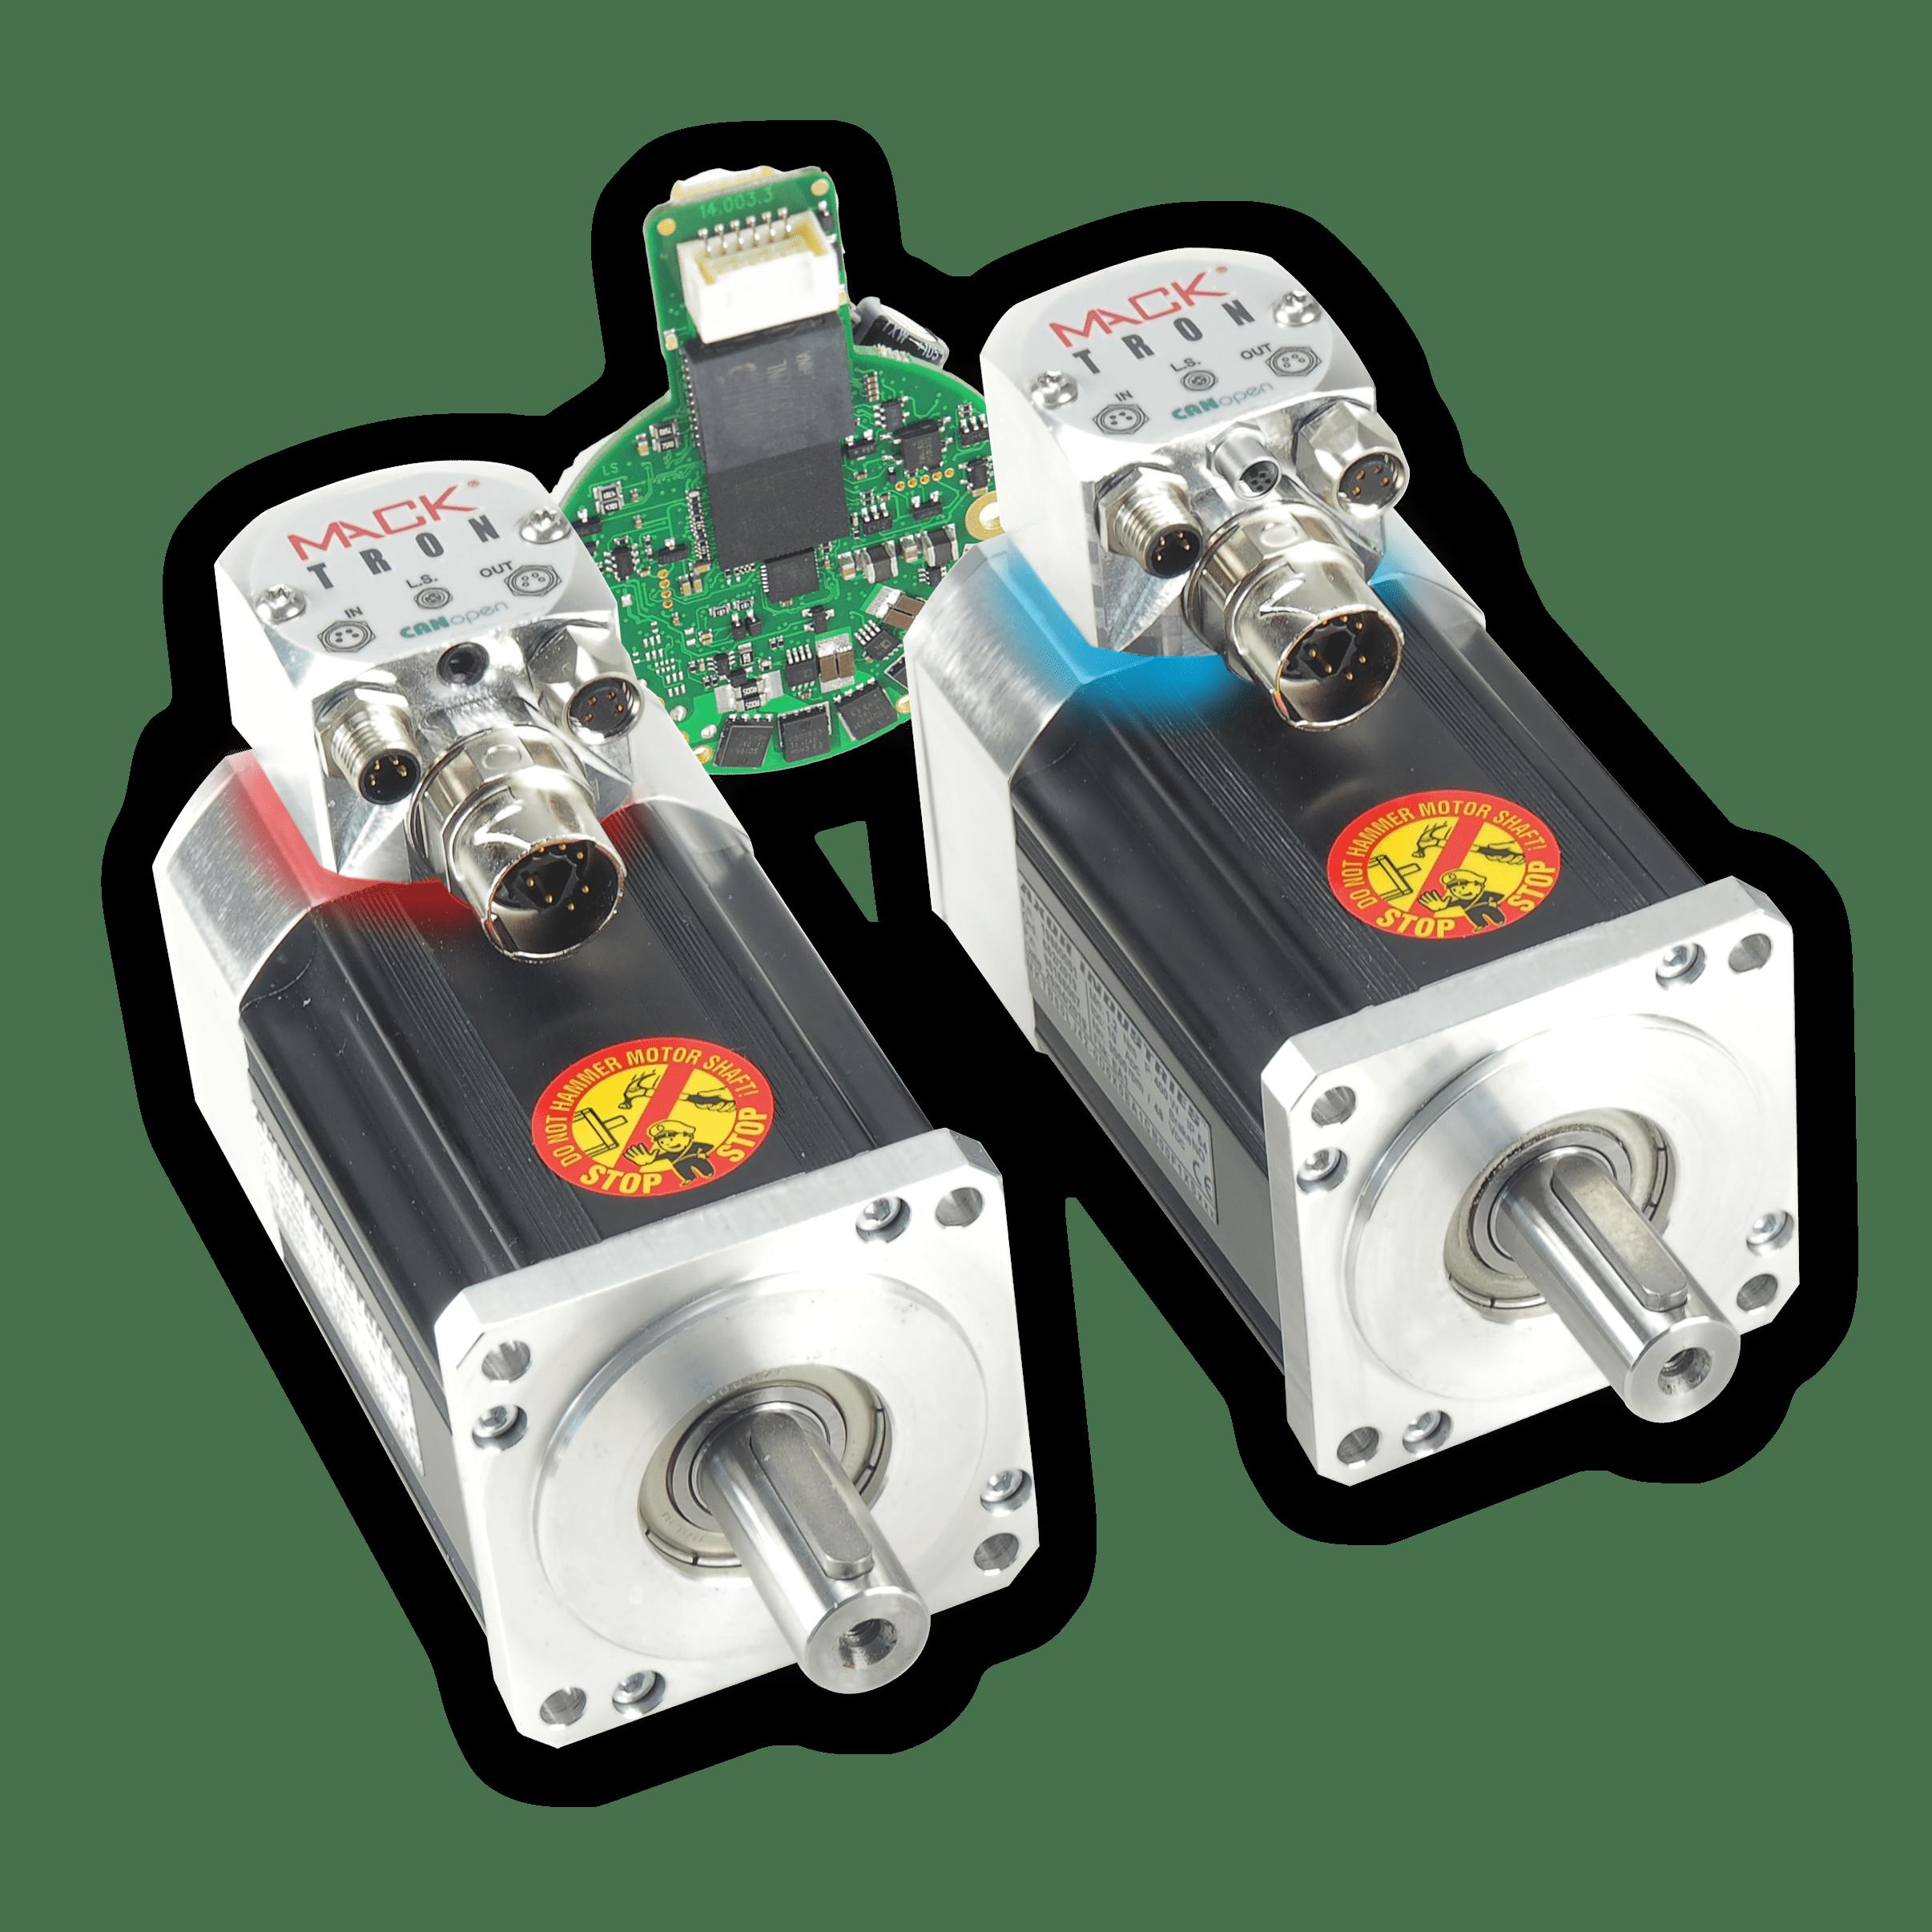 integratedservomotors-1